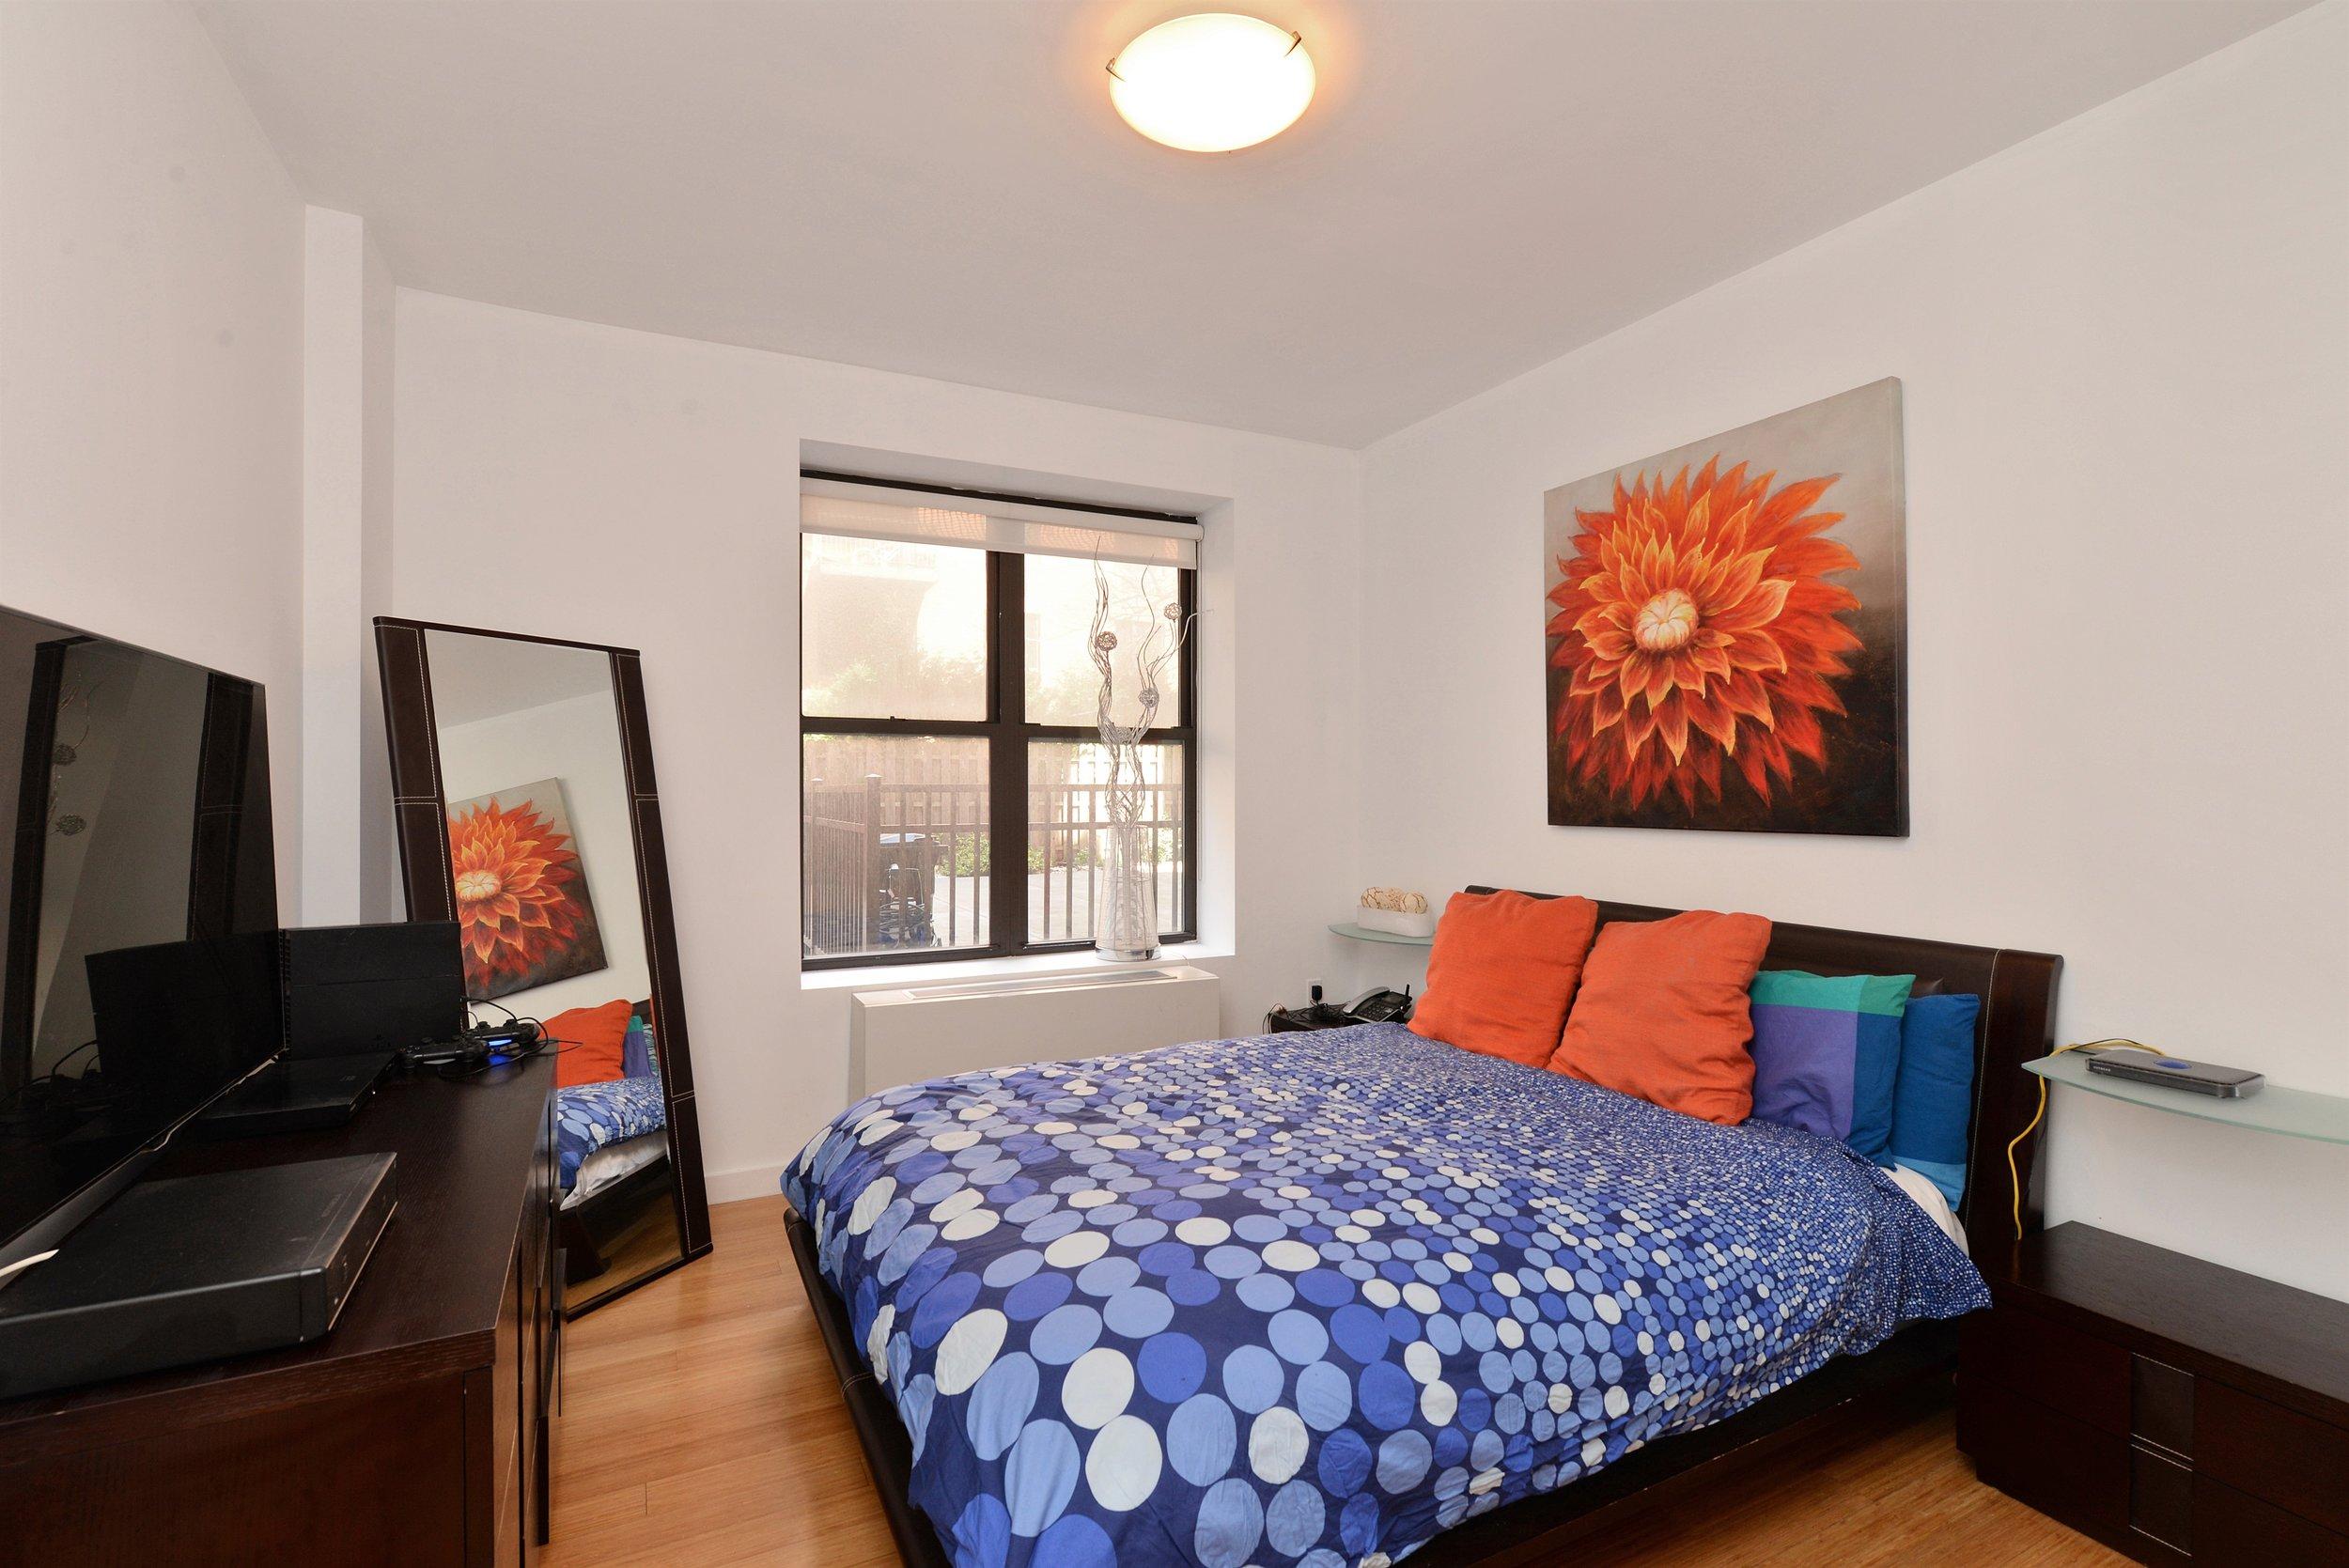 317 E 111 - Bedroom.jpg